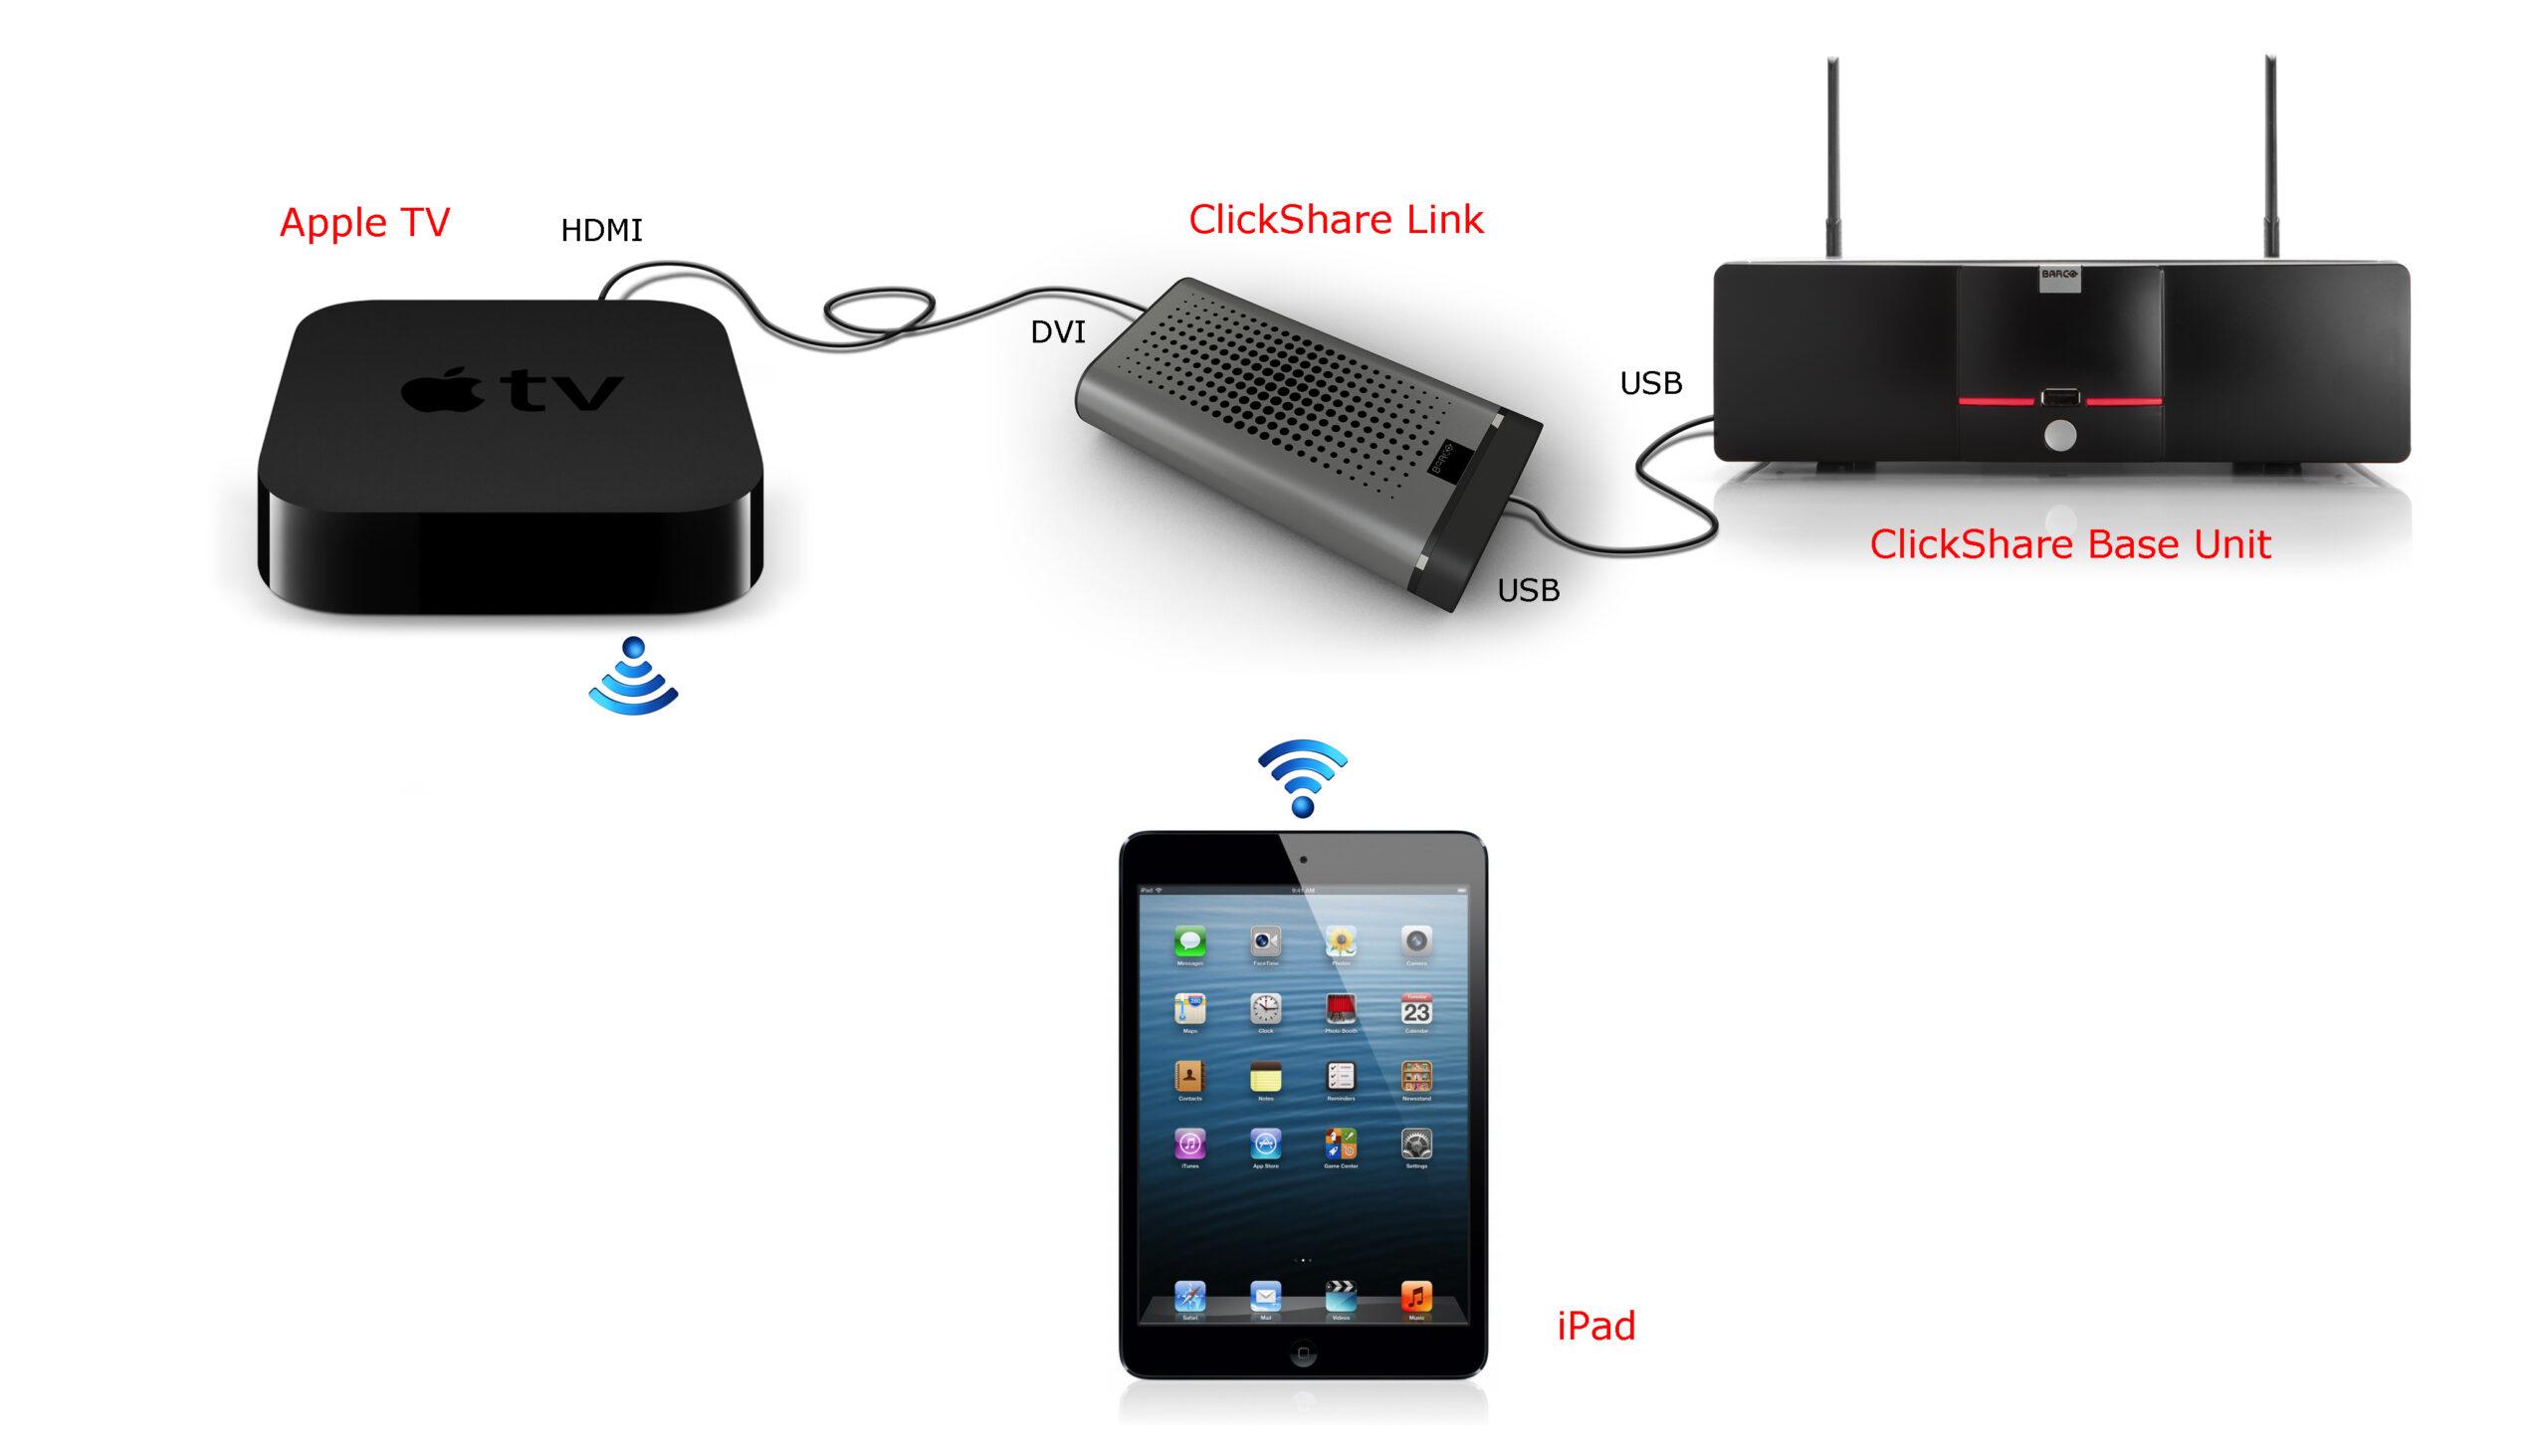 iPad with Apple TV